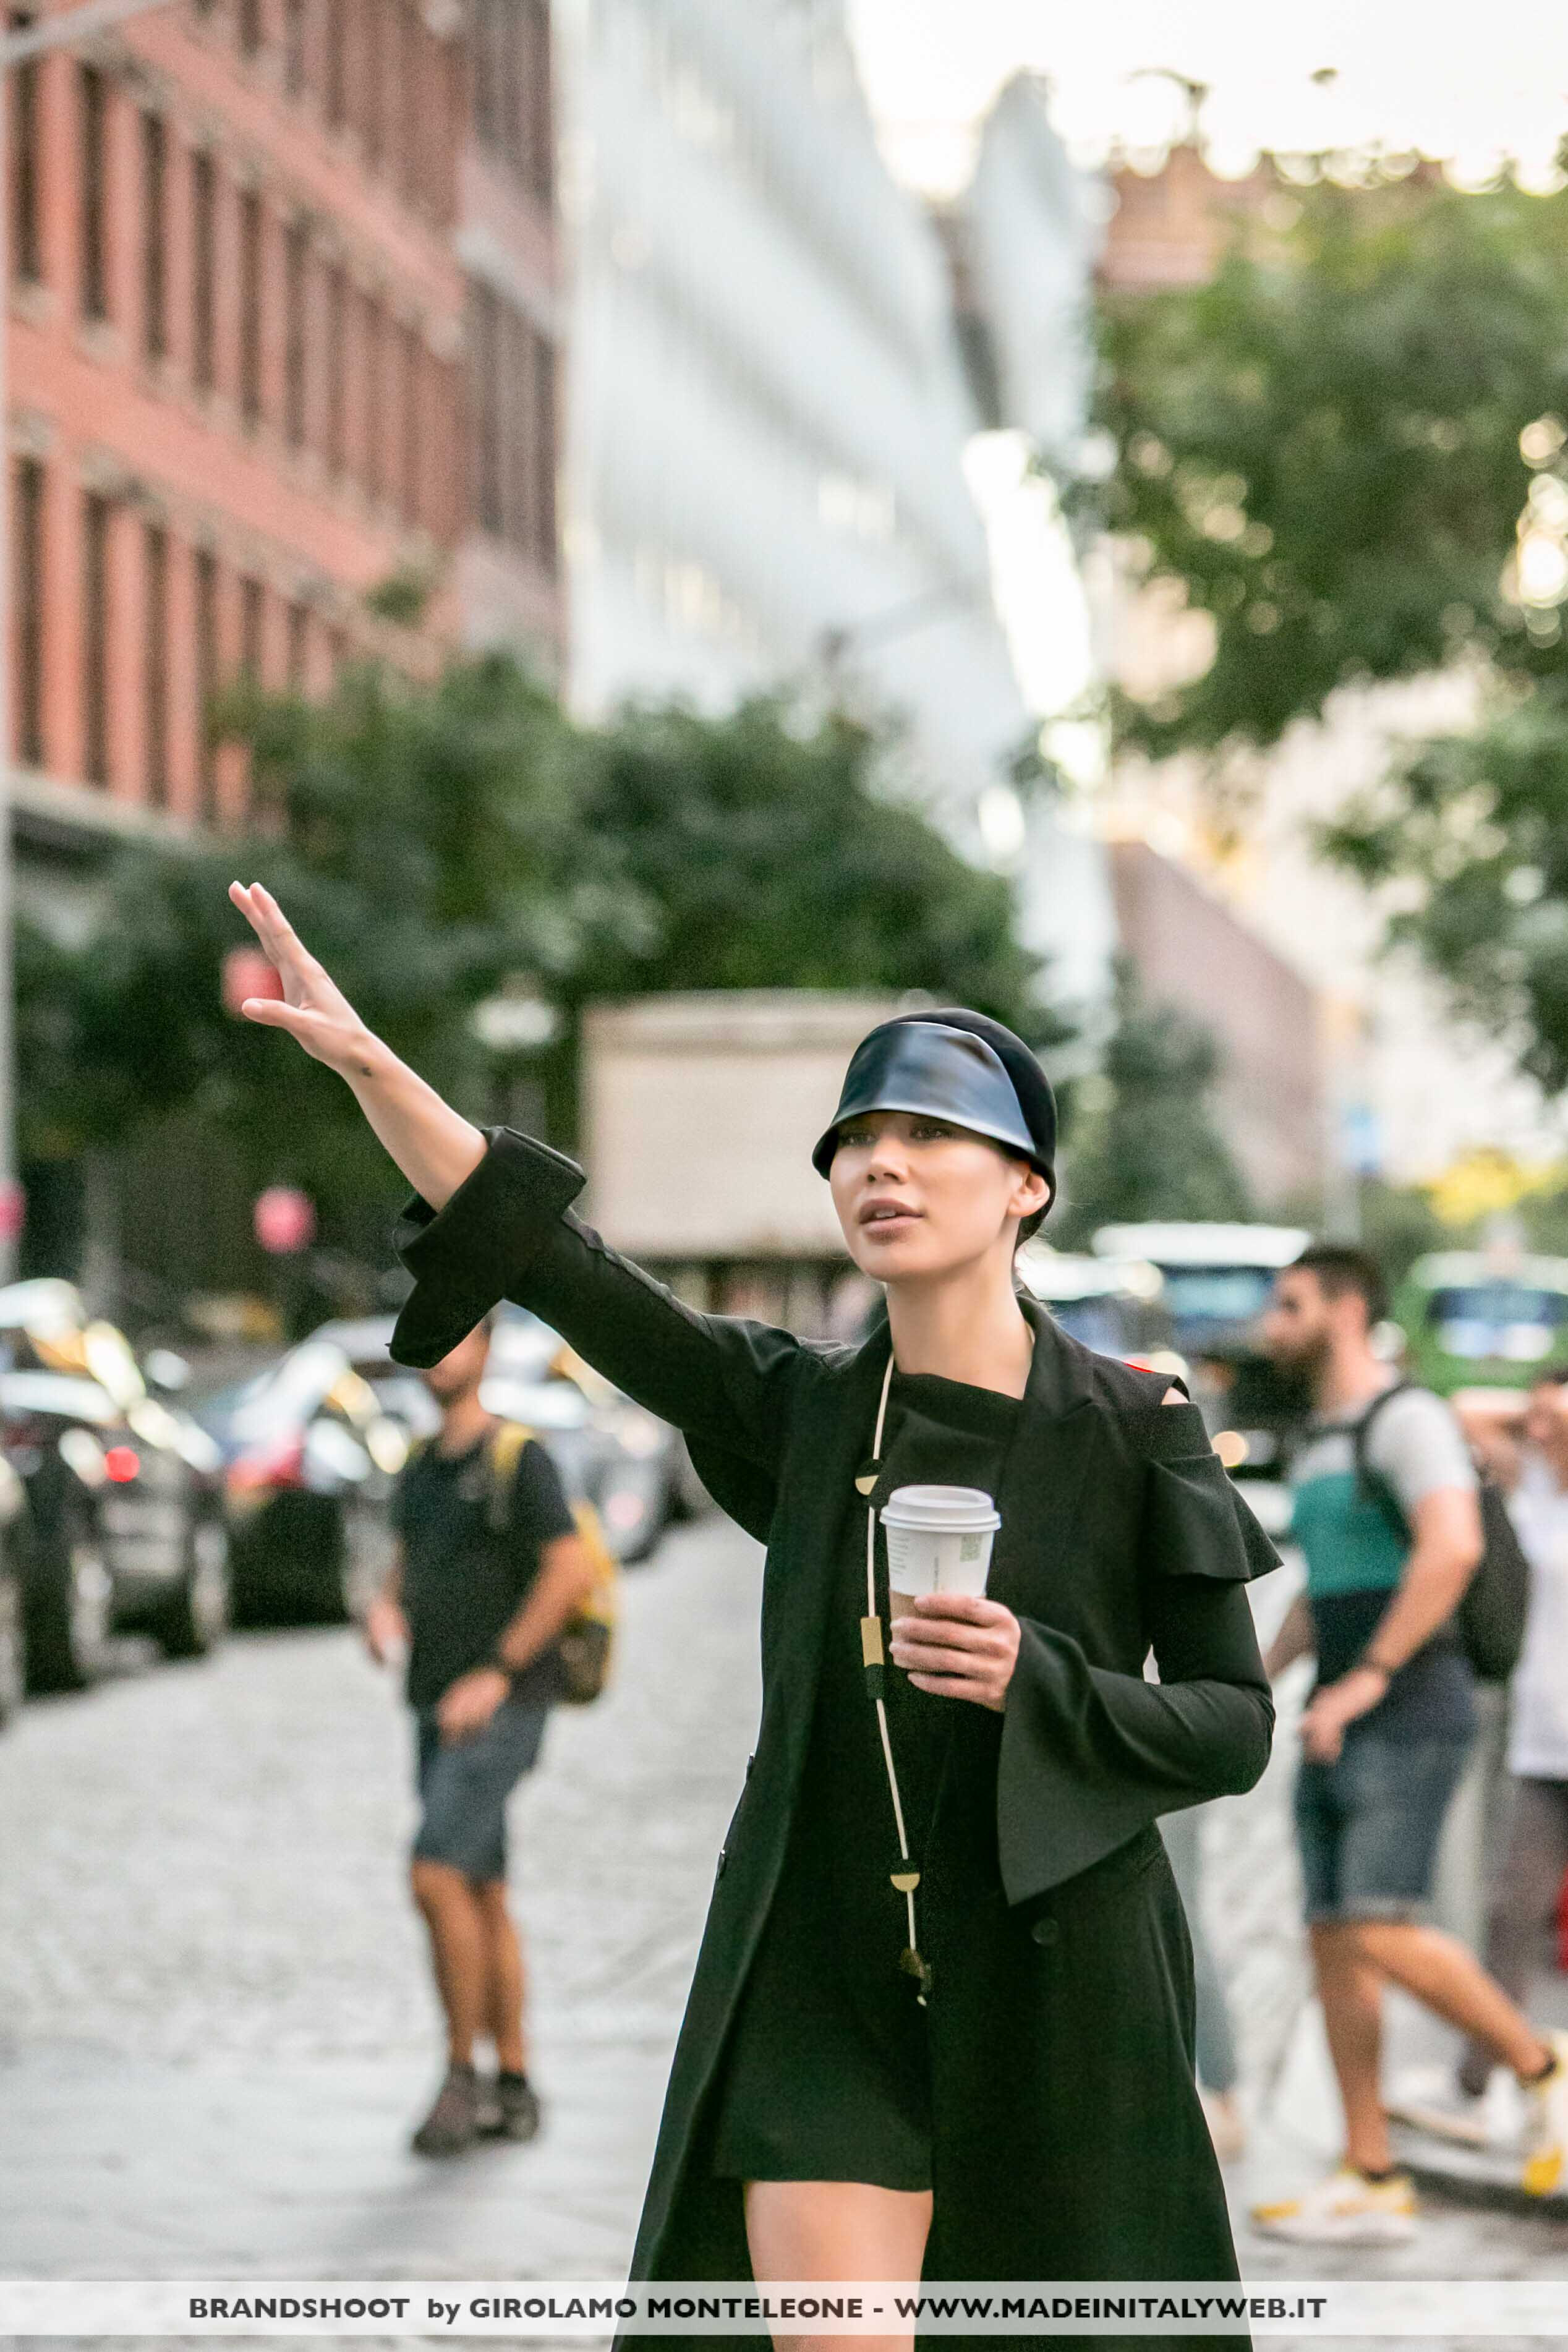 fashion street photographer NEWYORK ROMA CADOCAP NEW_YORK_GIROLAMO_MONTELEONE_2018ottobre032359141790_IMG_9356